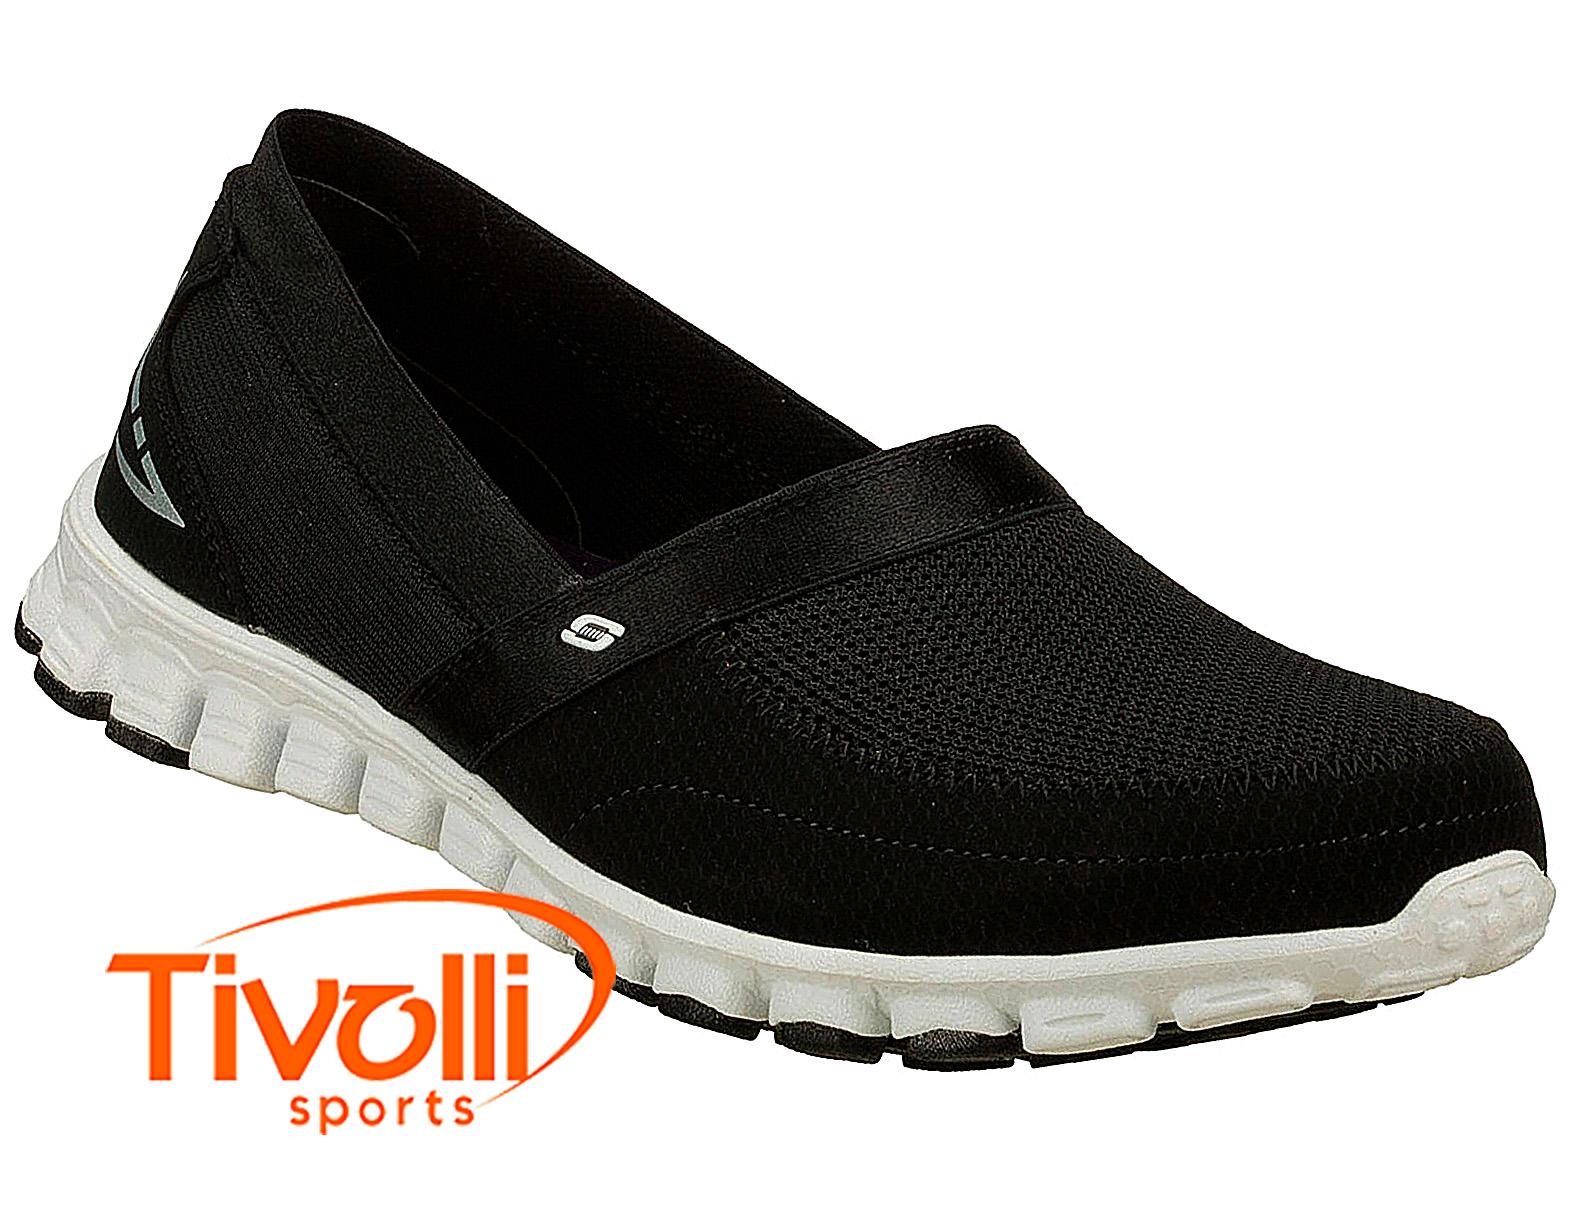 0ee3213aa7d Tênis sapatilha Skechers Ez Flex Take it Easy Feminino preto e branco